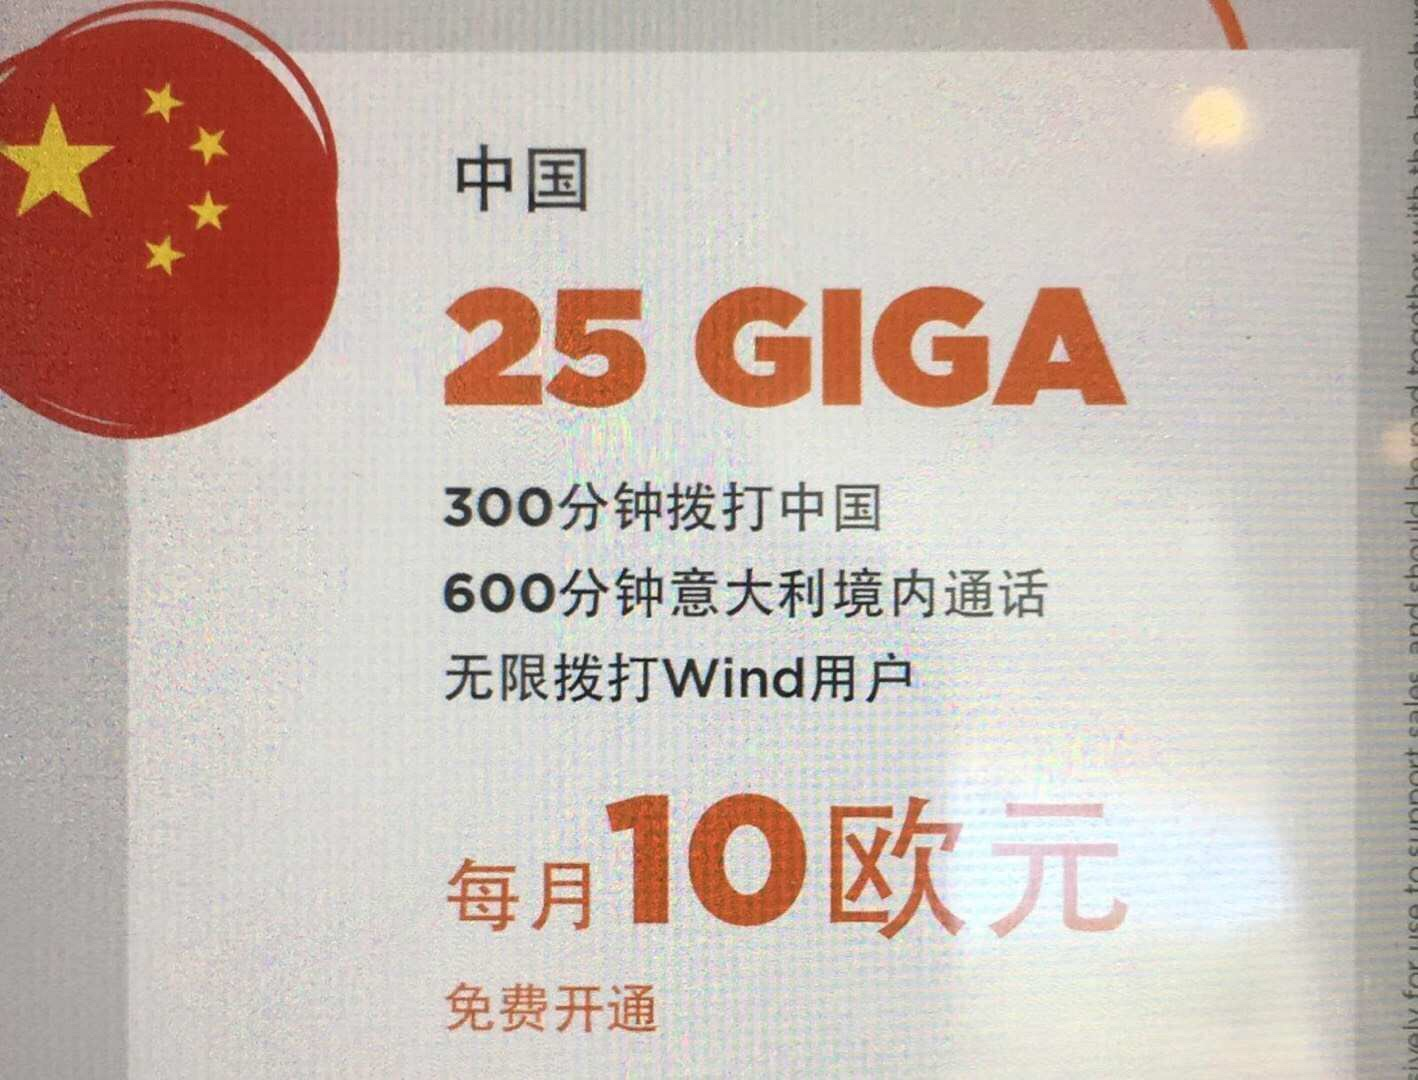 Wind中国特惠套餐,25GB,300分钟打中国,600分钟打意大利,无限制打Wind卡,月租10欧